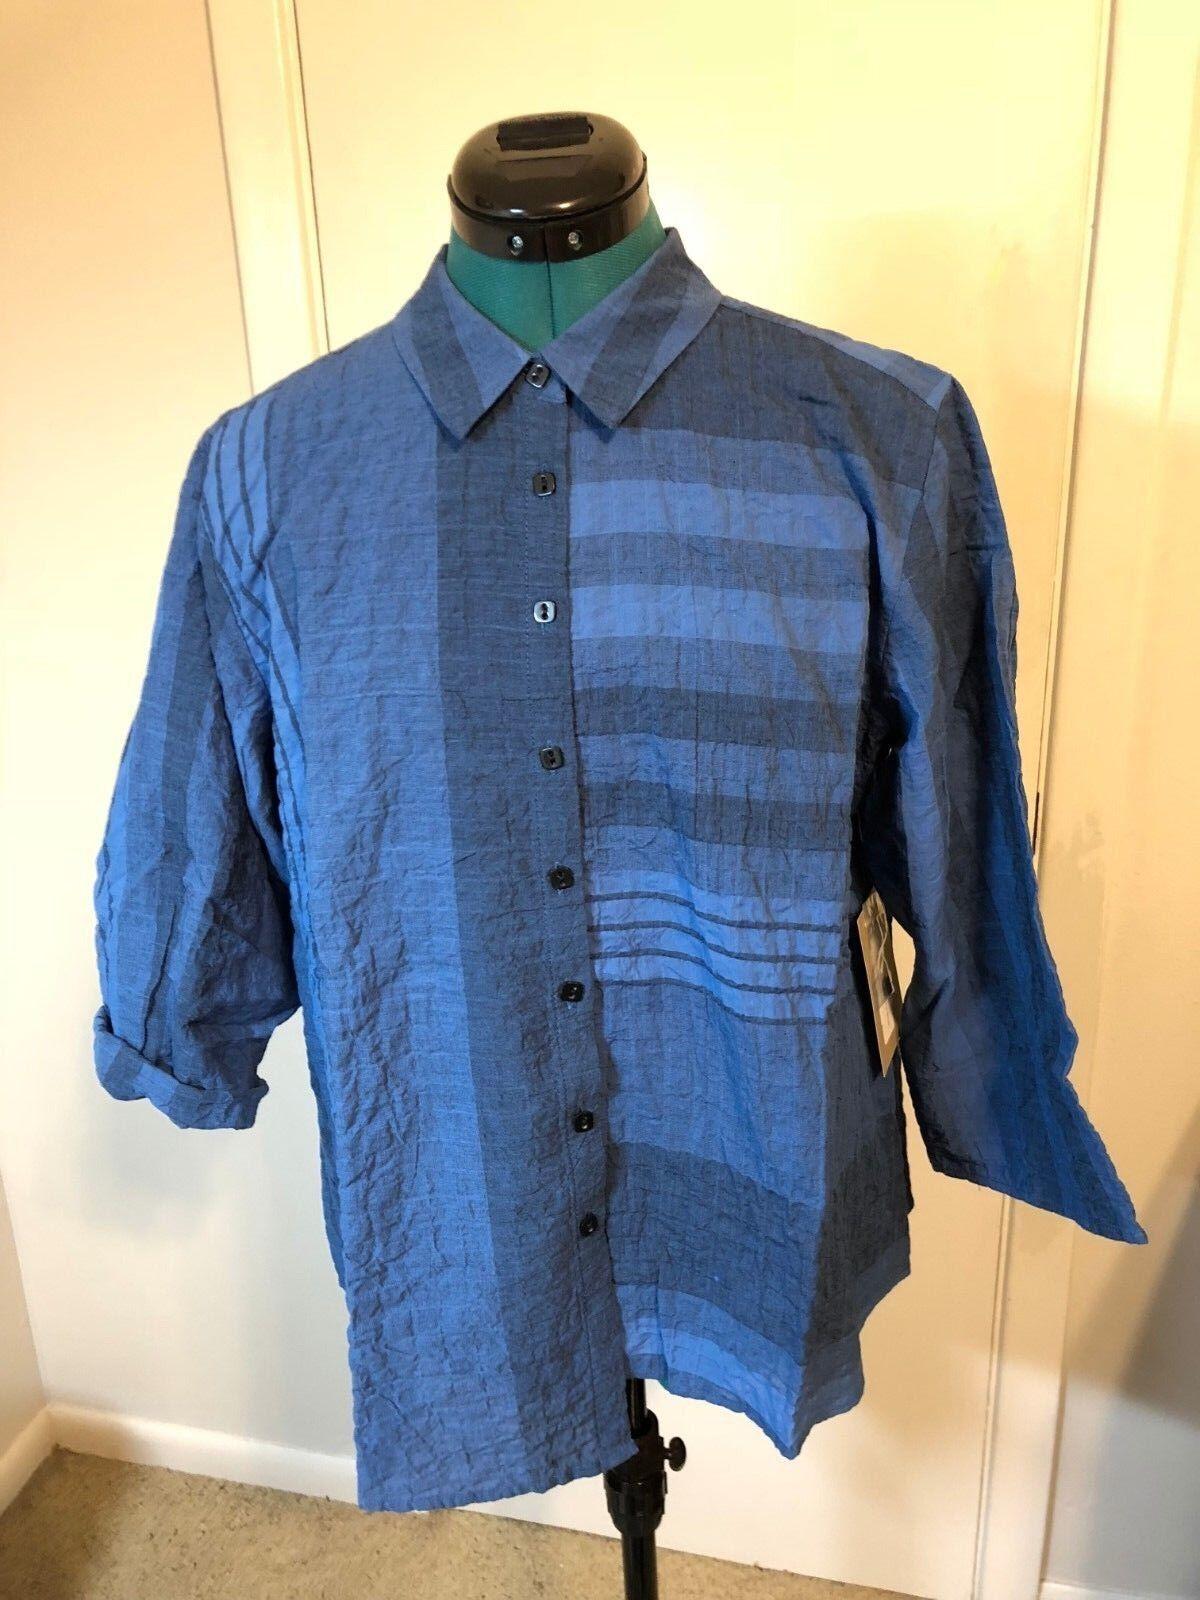 Habitat Evening Blau striped shirt.Größe L.NWT.